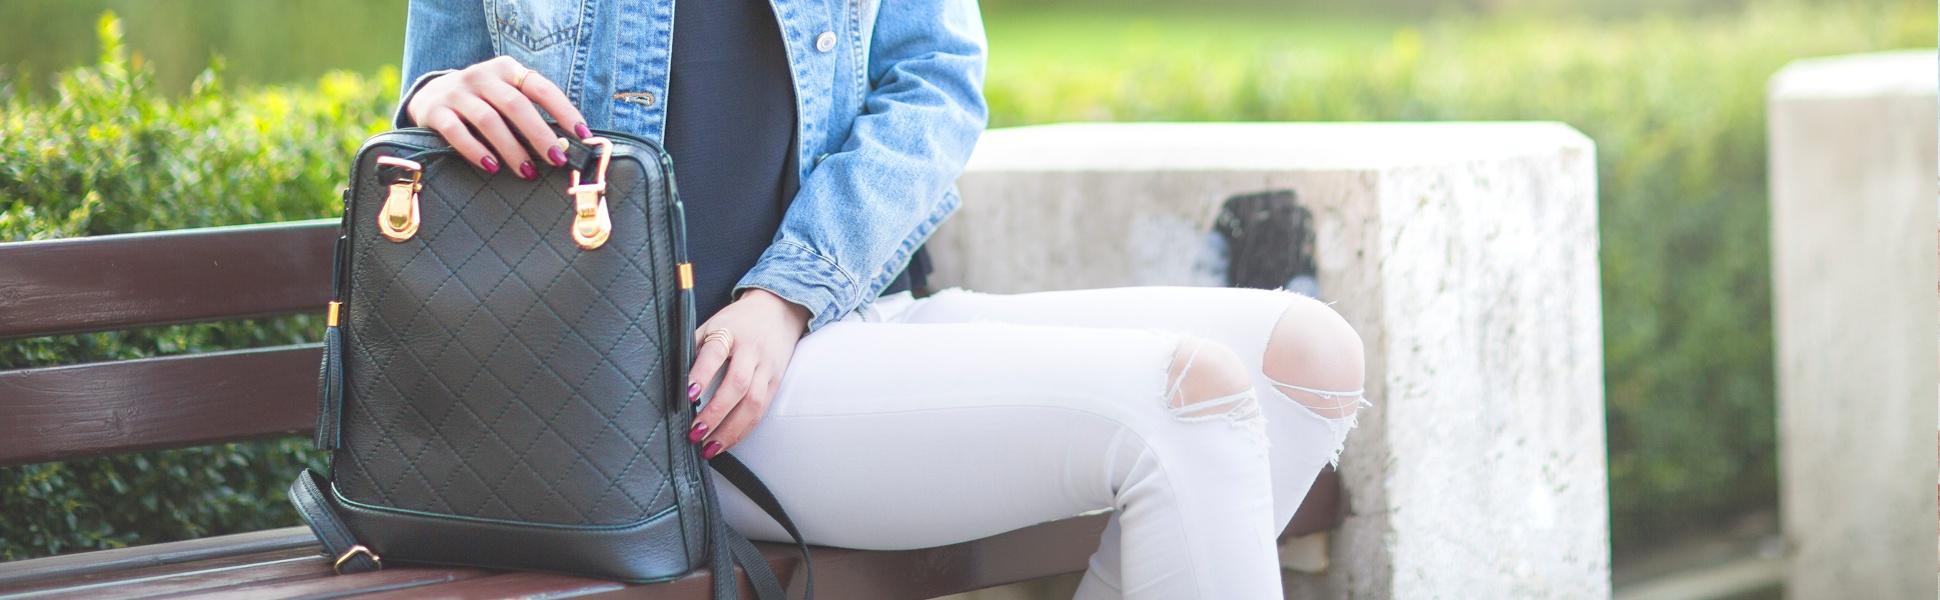 modne damske ruksaky a batohy